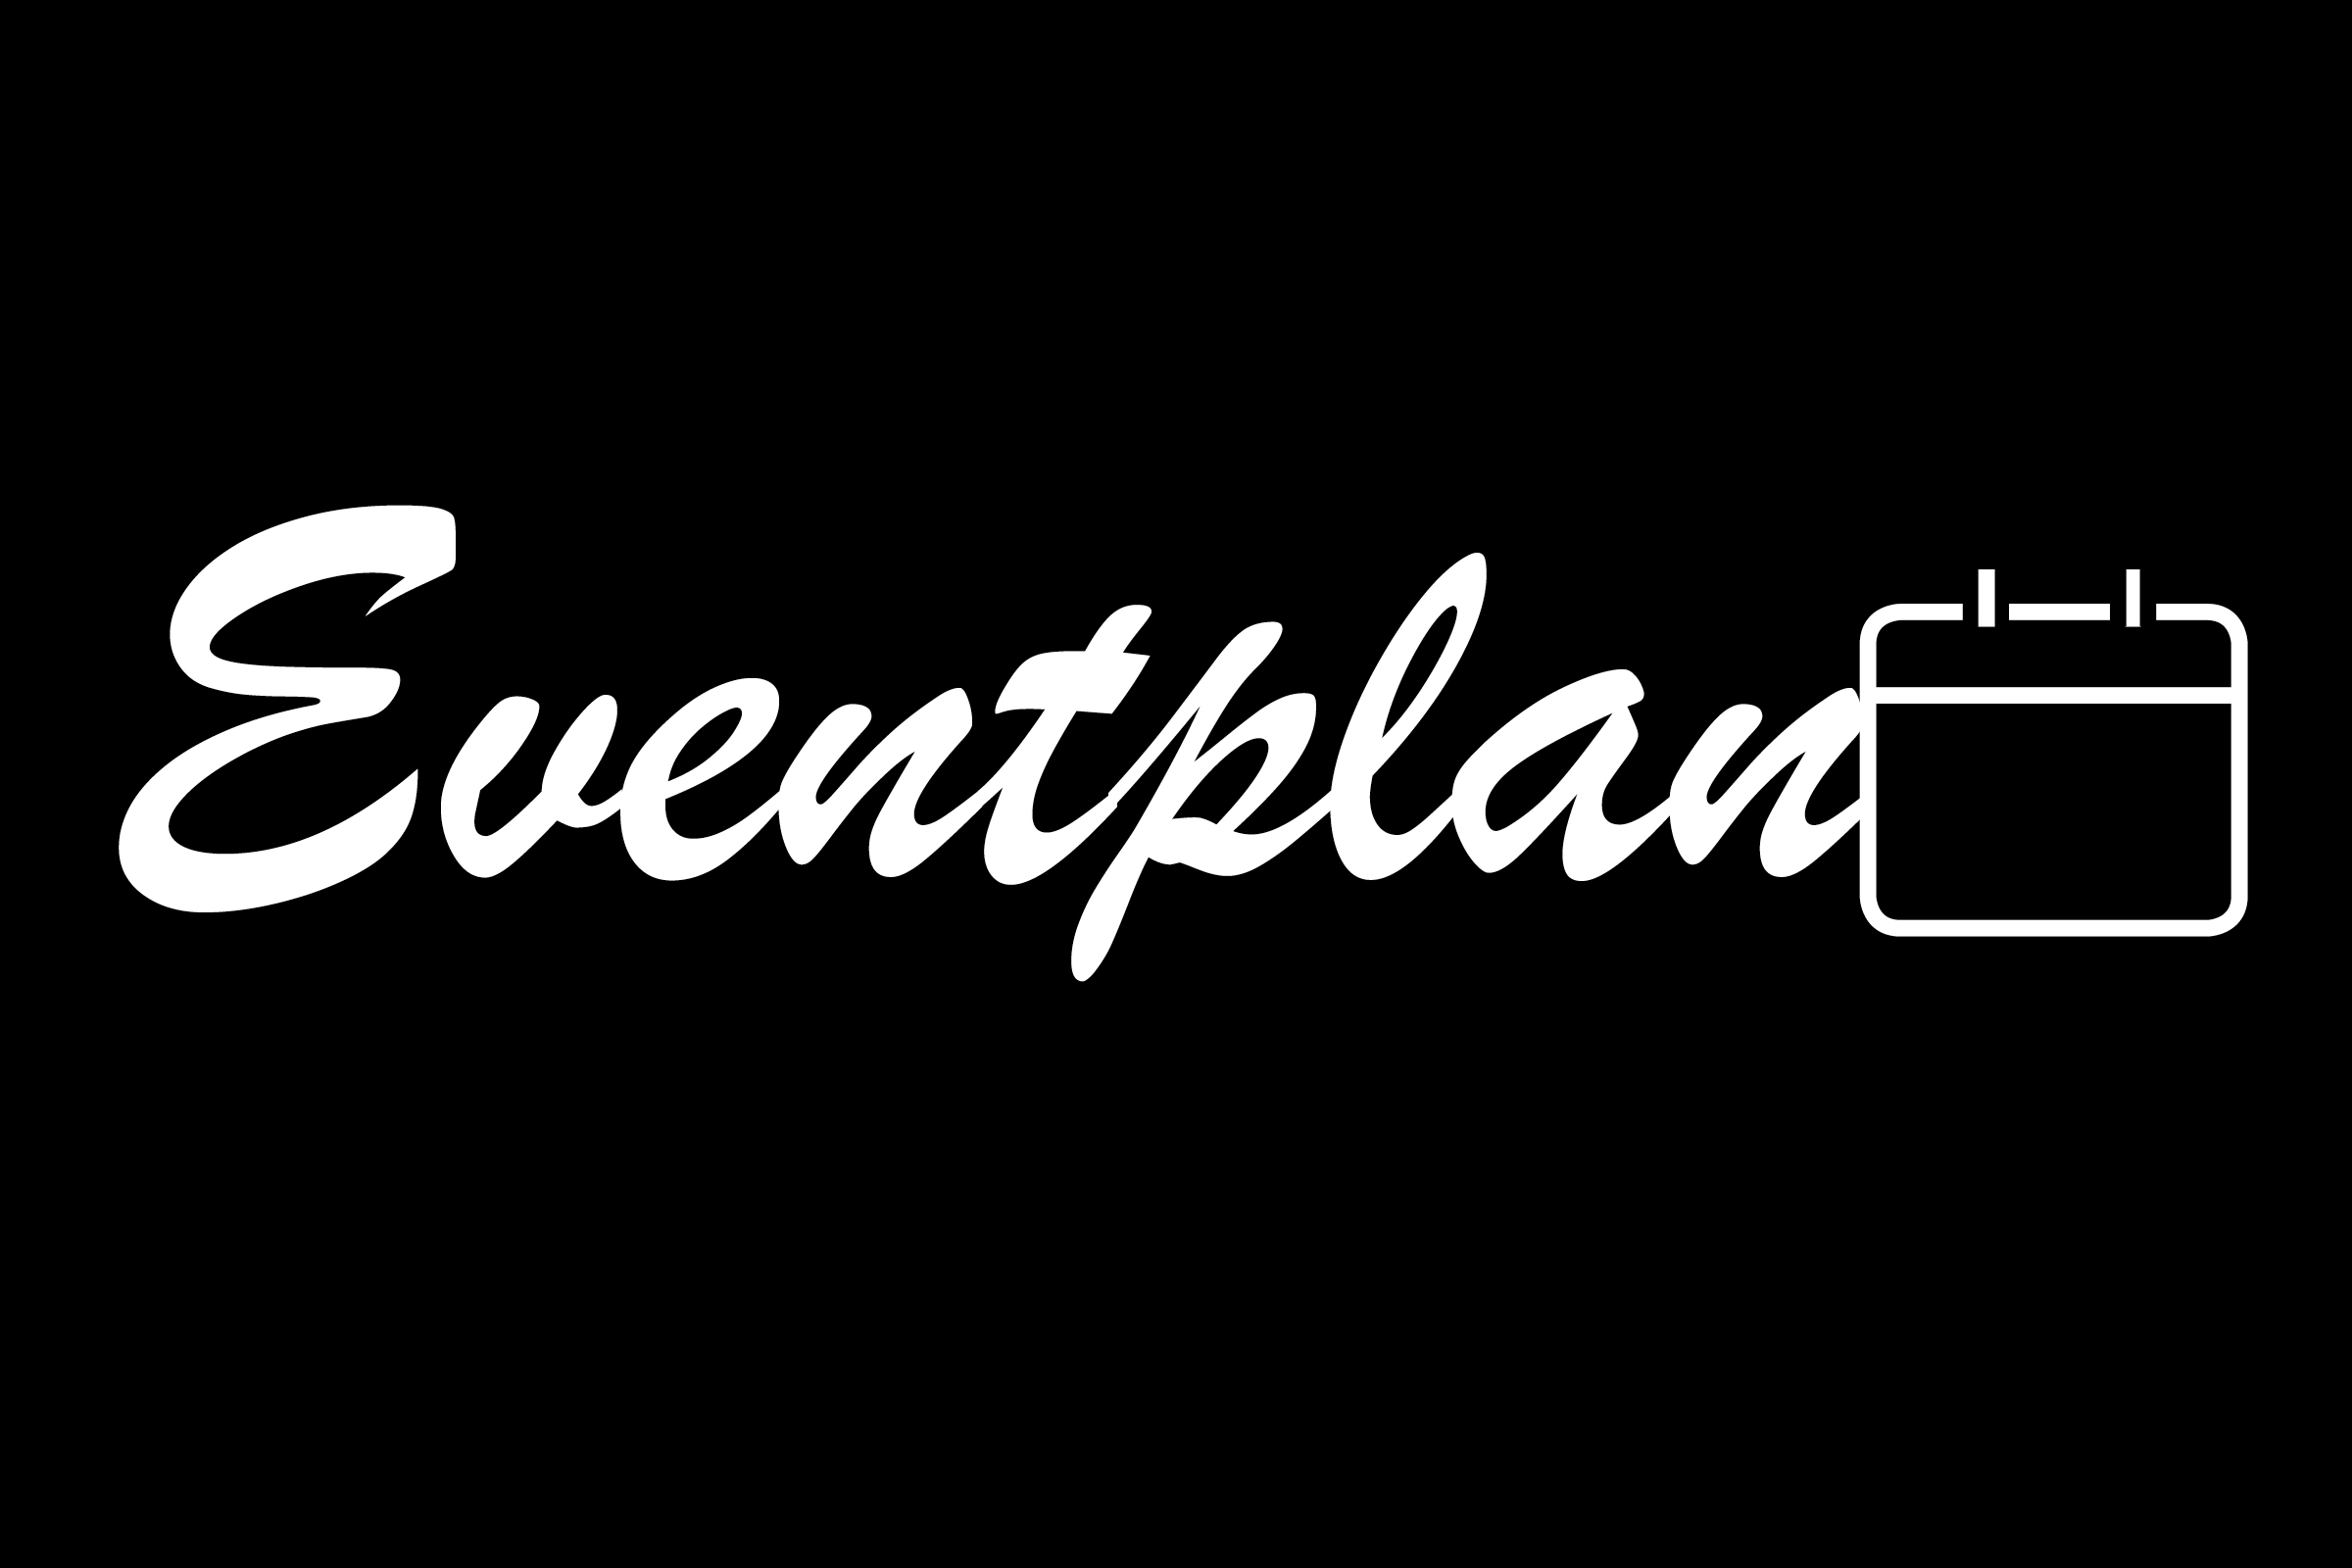 Eventplan